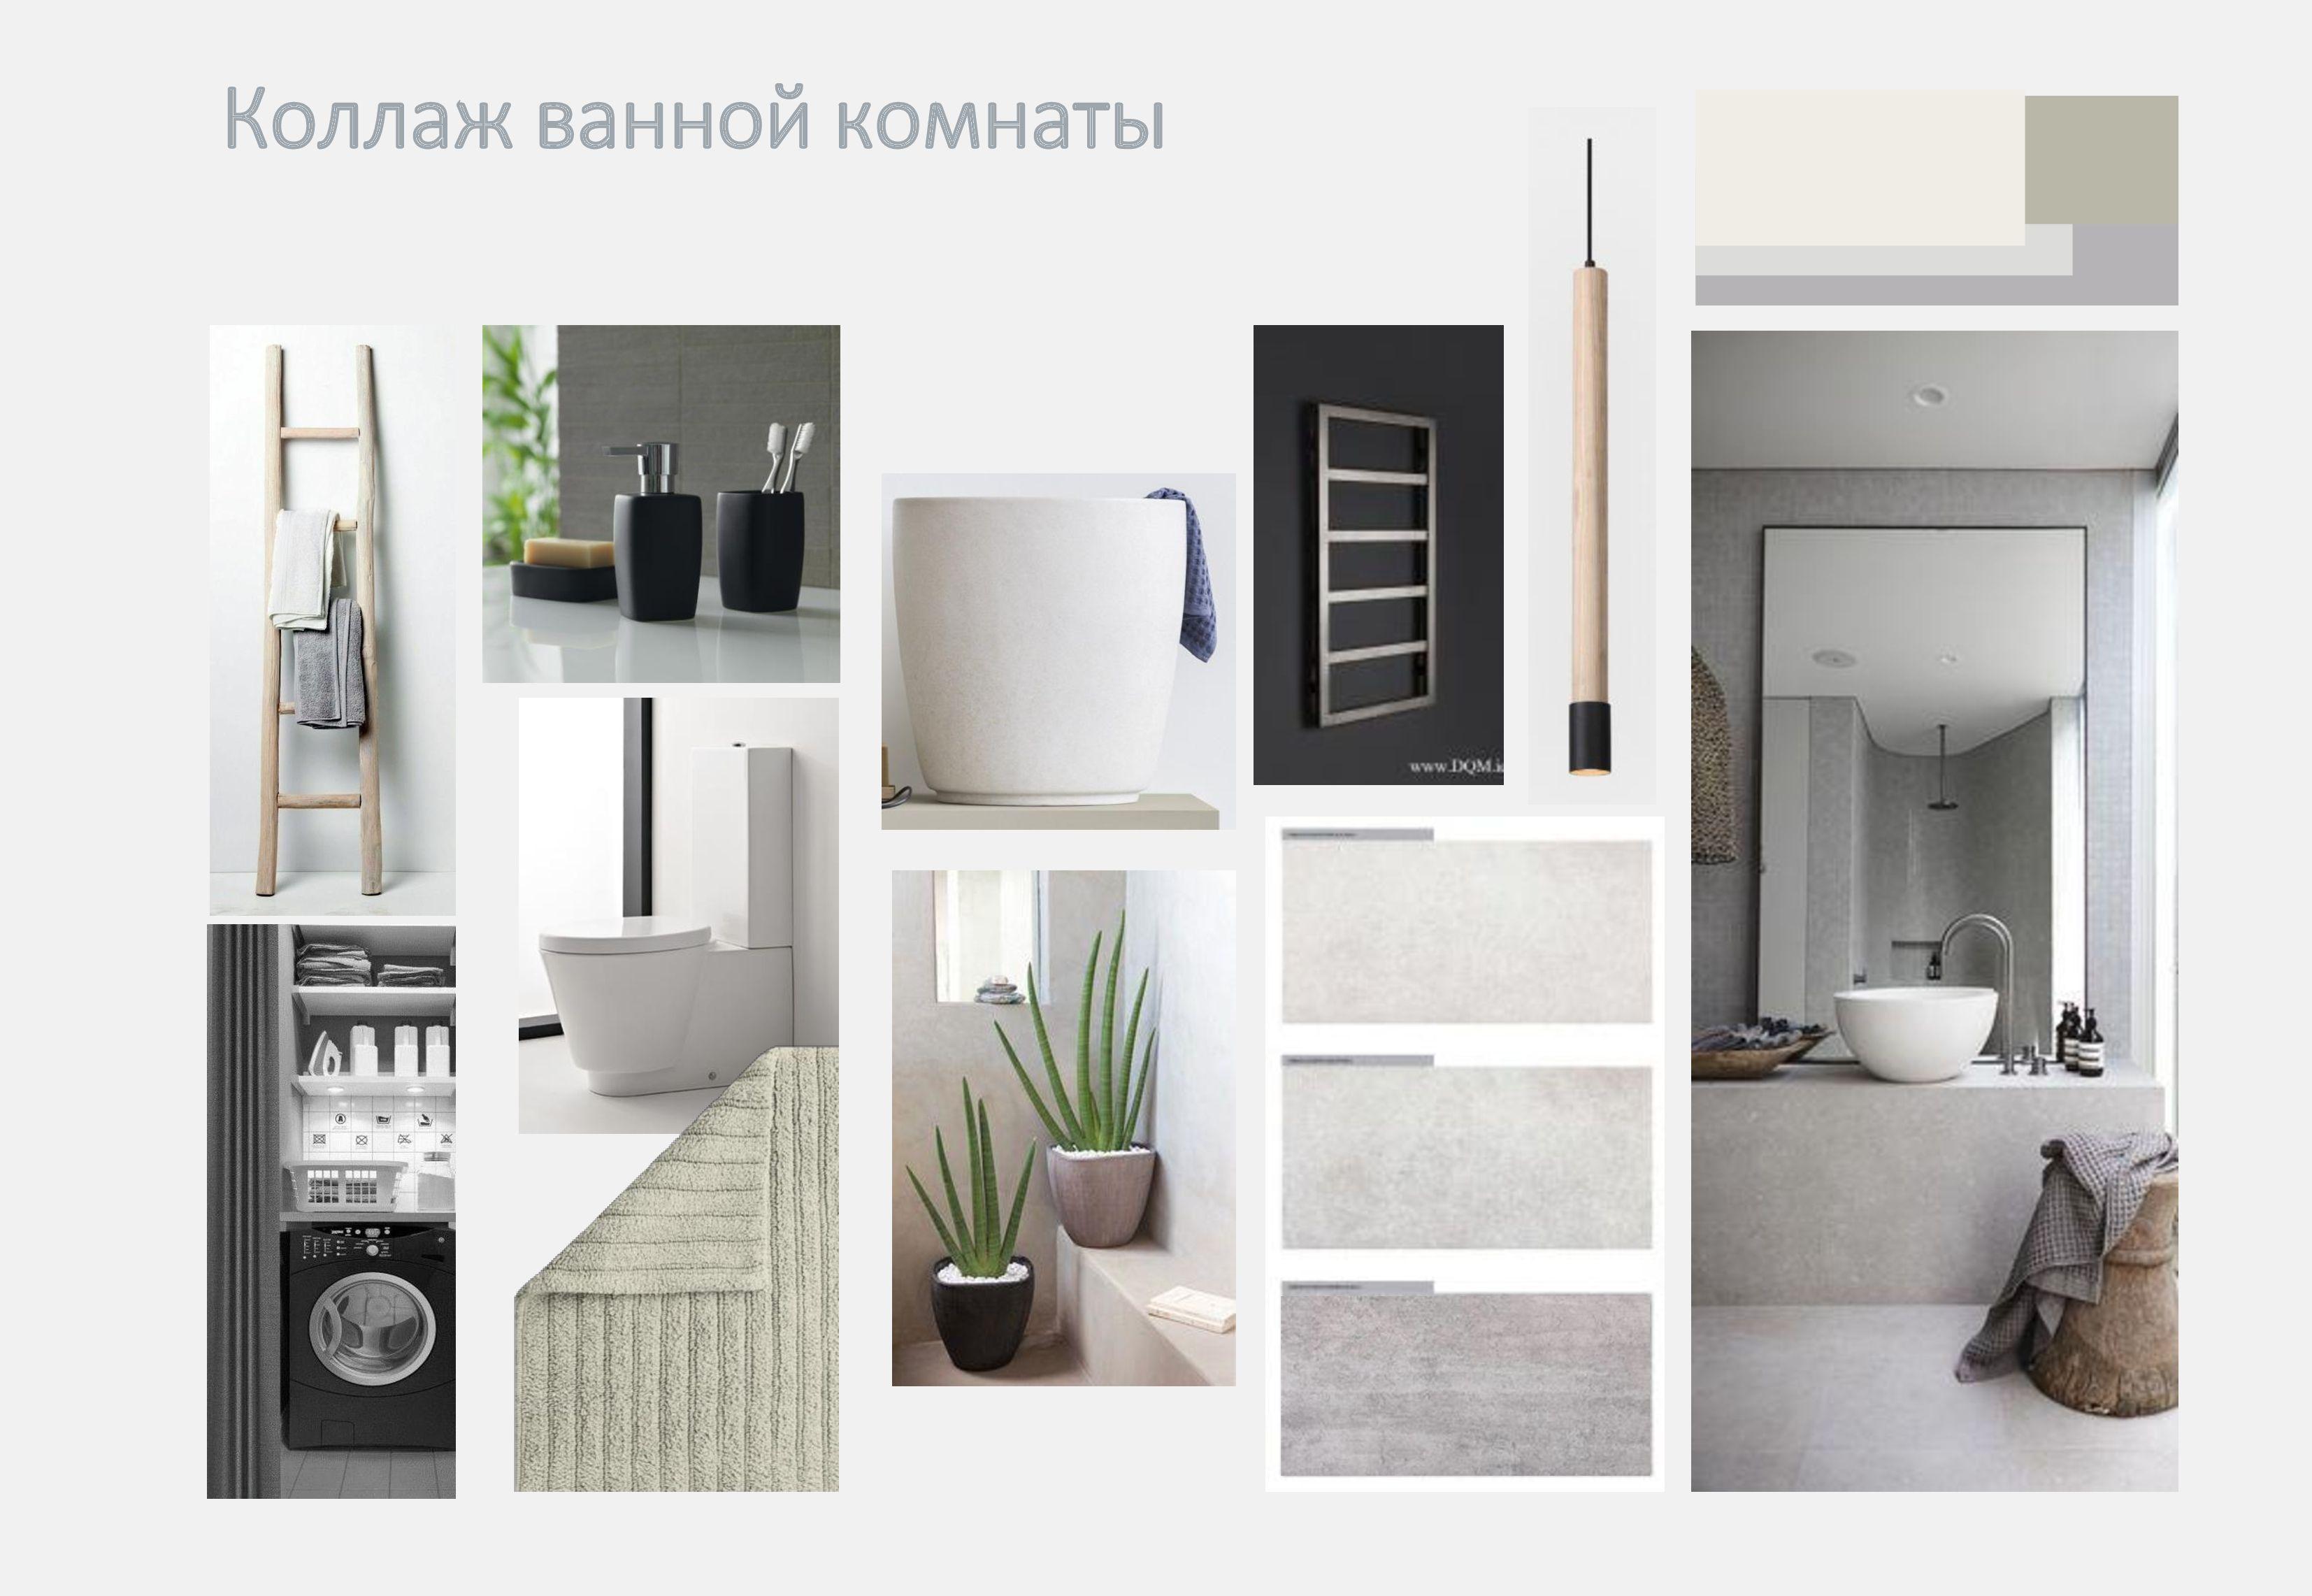 New nordic eco style bathroom collage by katerina gavriliuk interior decor course